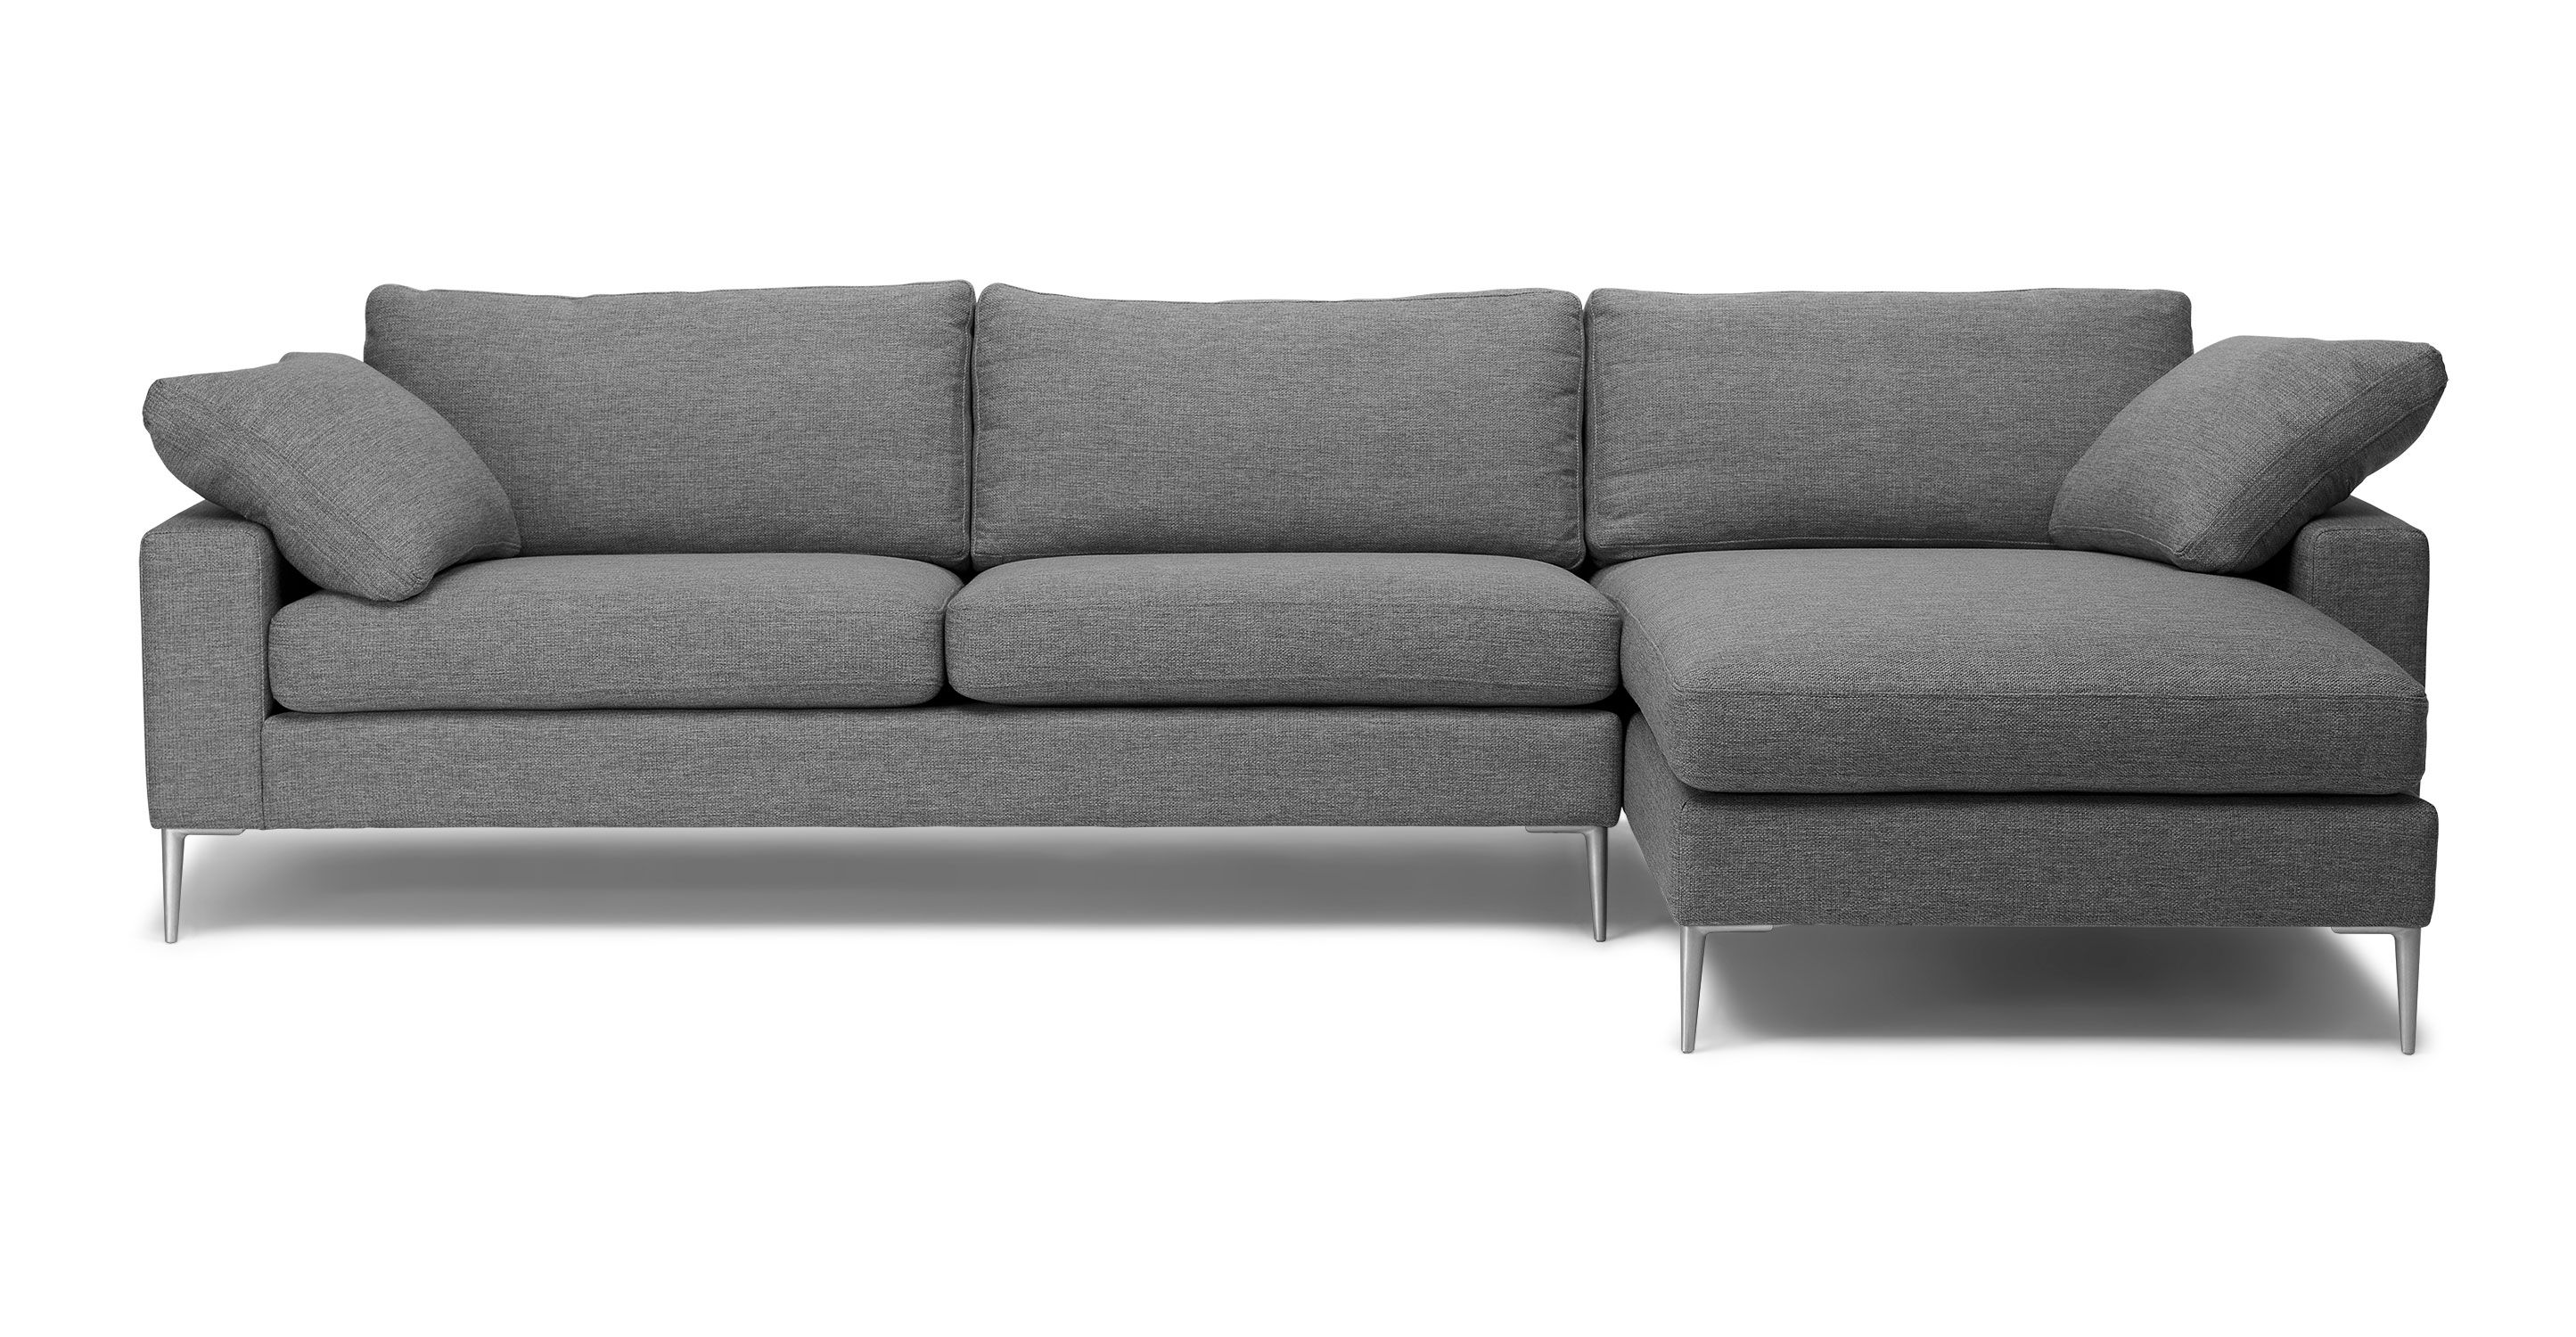 Nova Gravel Gray Right Sectional Sofa Modern Sofa Sectional Mid Century Modern Sectional Sofa Sectional Sofa